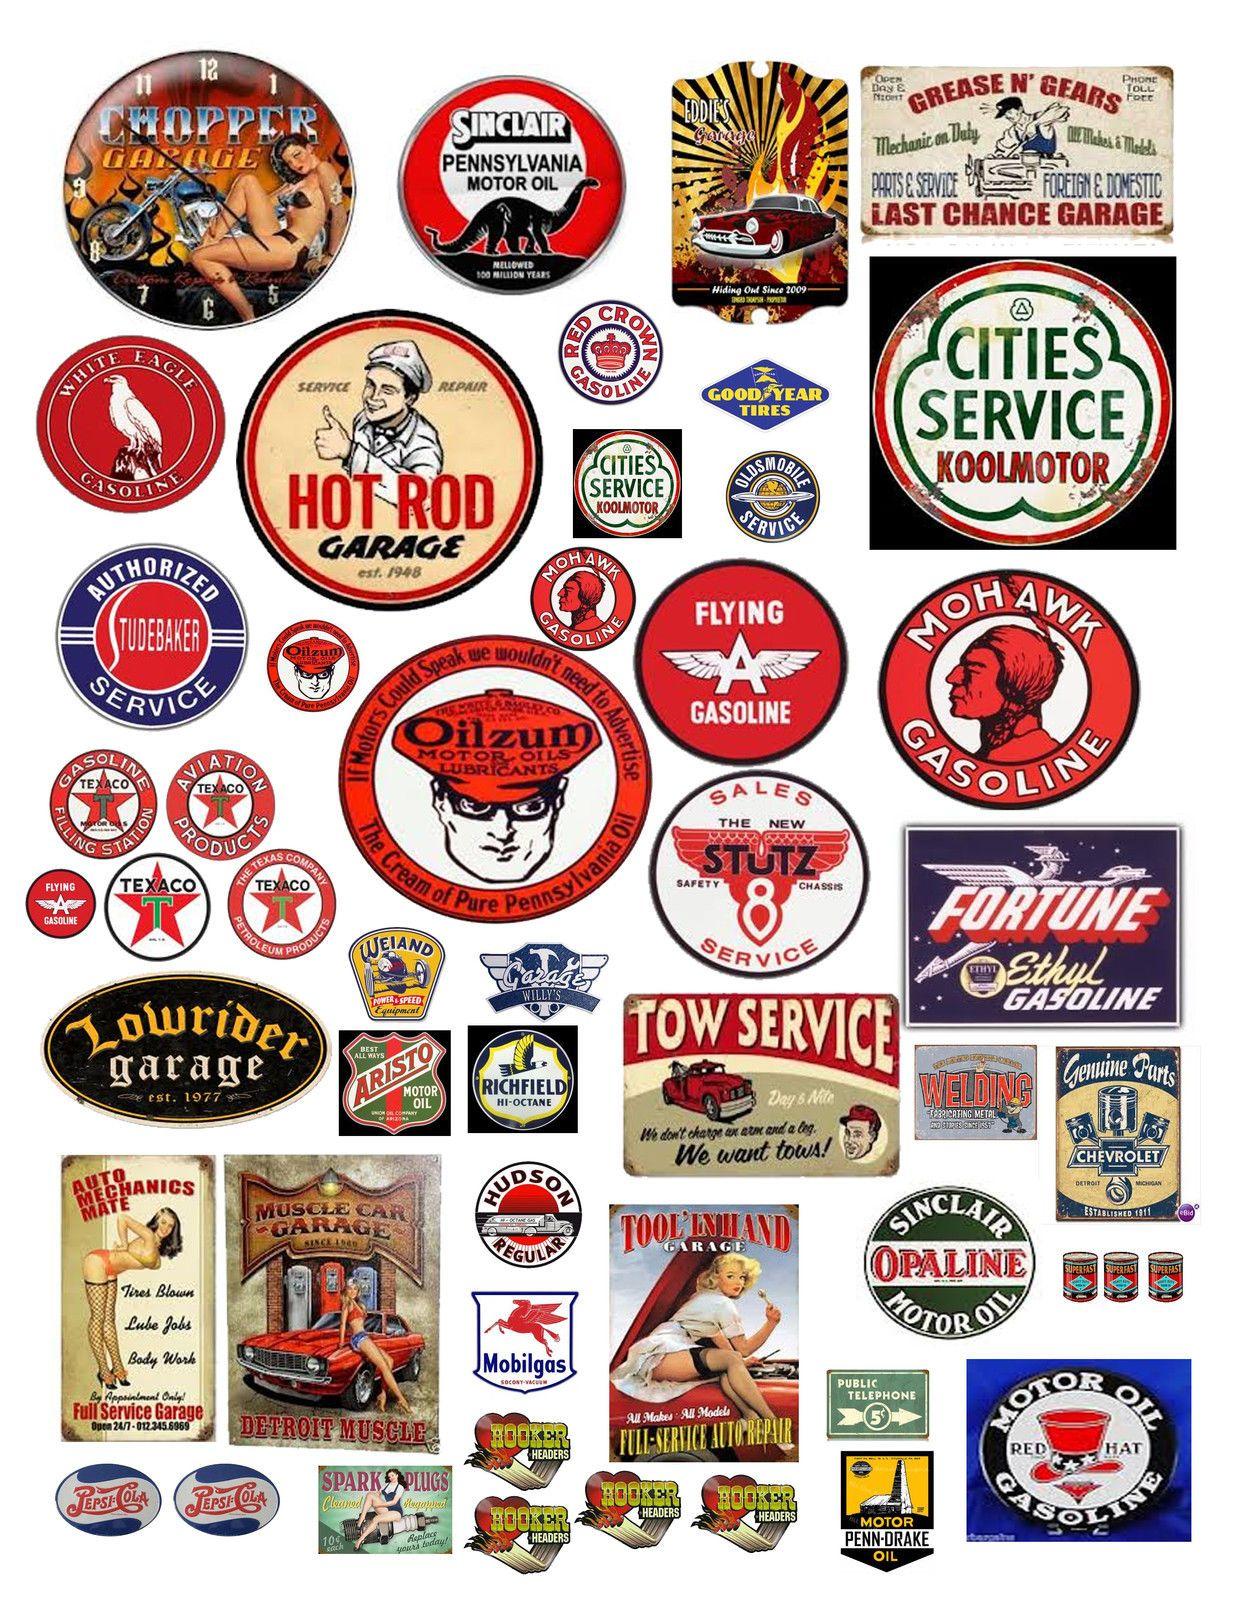 1 18 Vintage Garage Signs 3 Decals For Diecast Model Car Dioramas Car Model Model Trains Garage Signs [ 1600 x 1236 Pixel ]